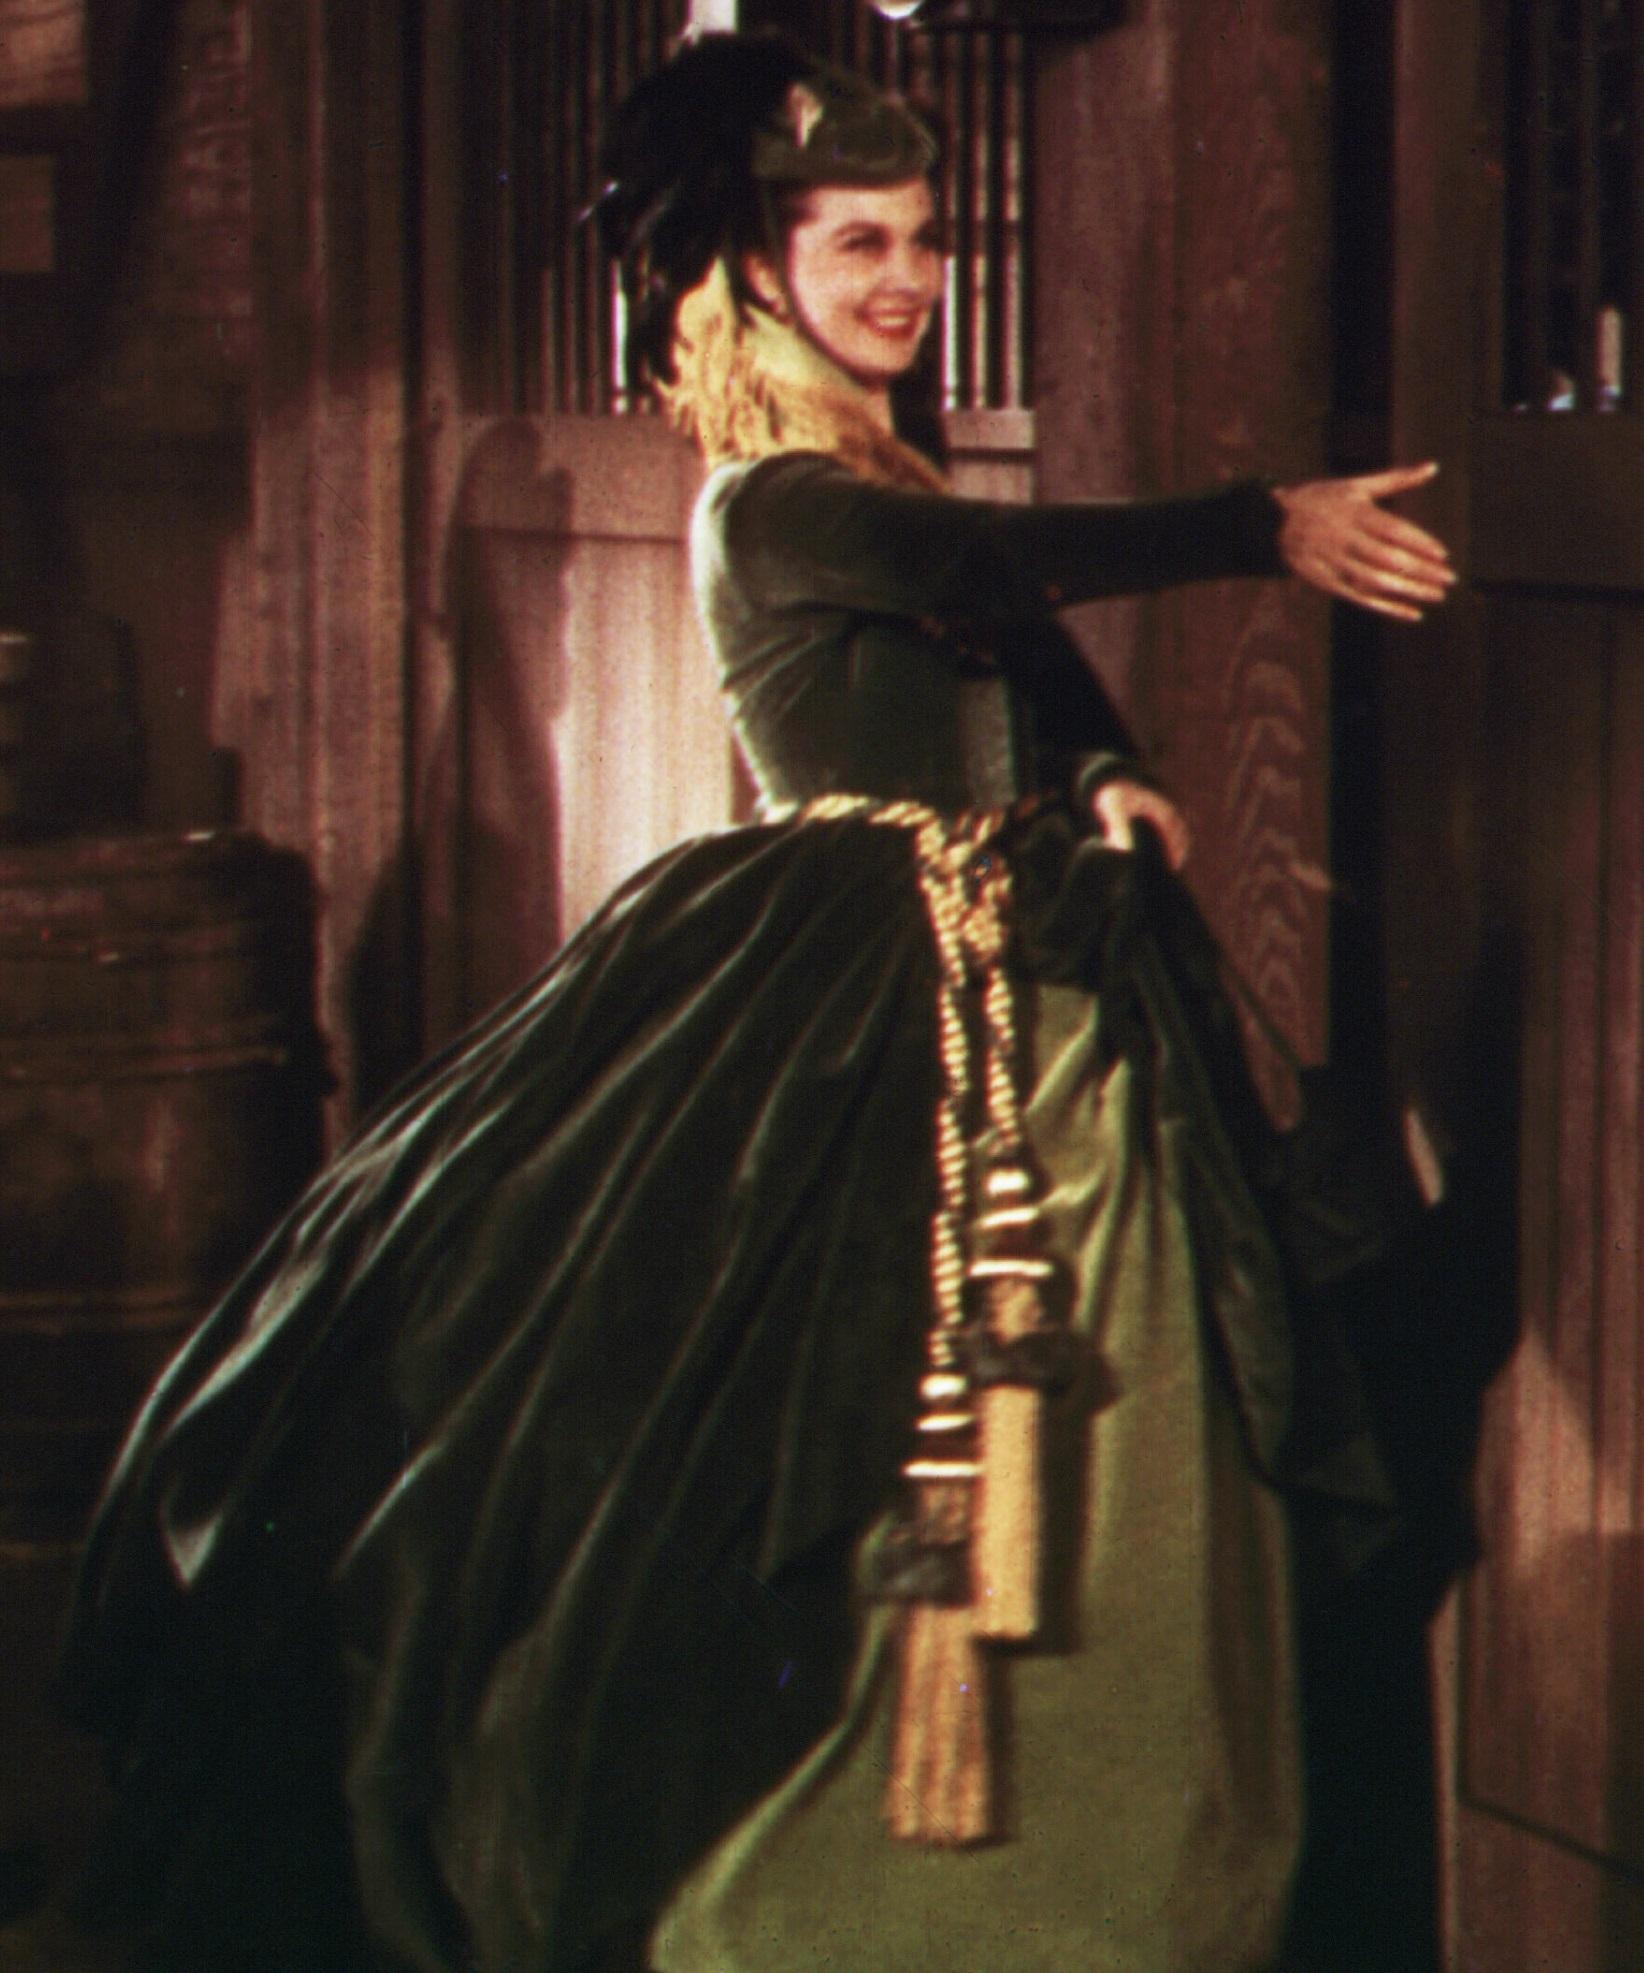 c05f6df300 Most iconic dresses in movie history | Gallery | Wonderwall.com